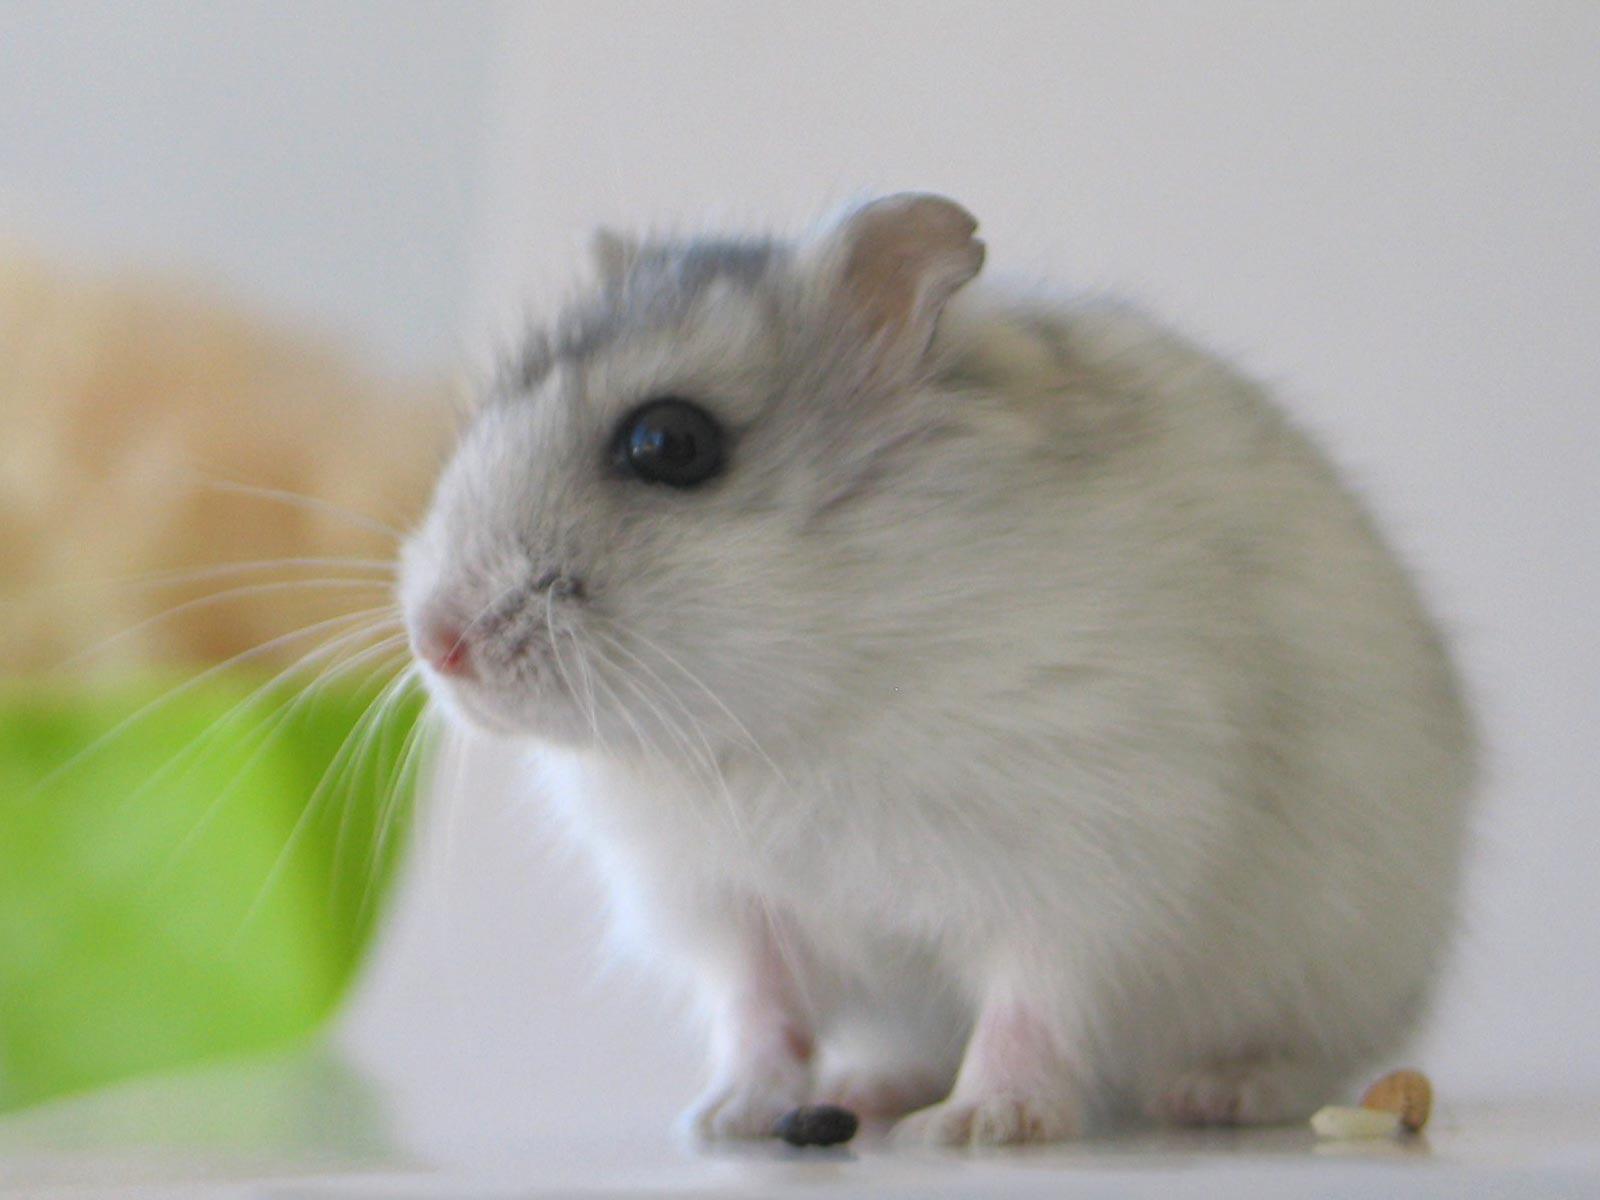 Mouse3 صور الفأر   Photo rat